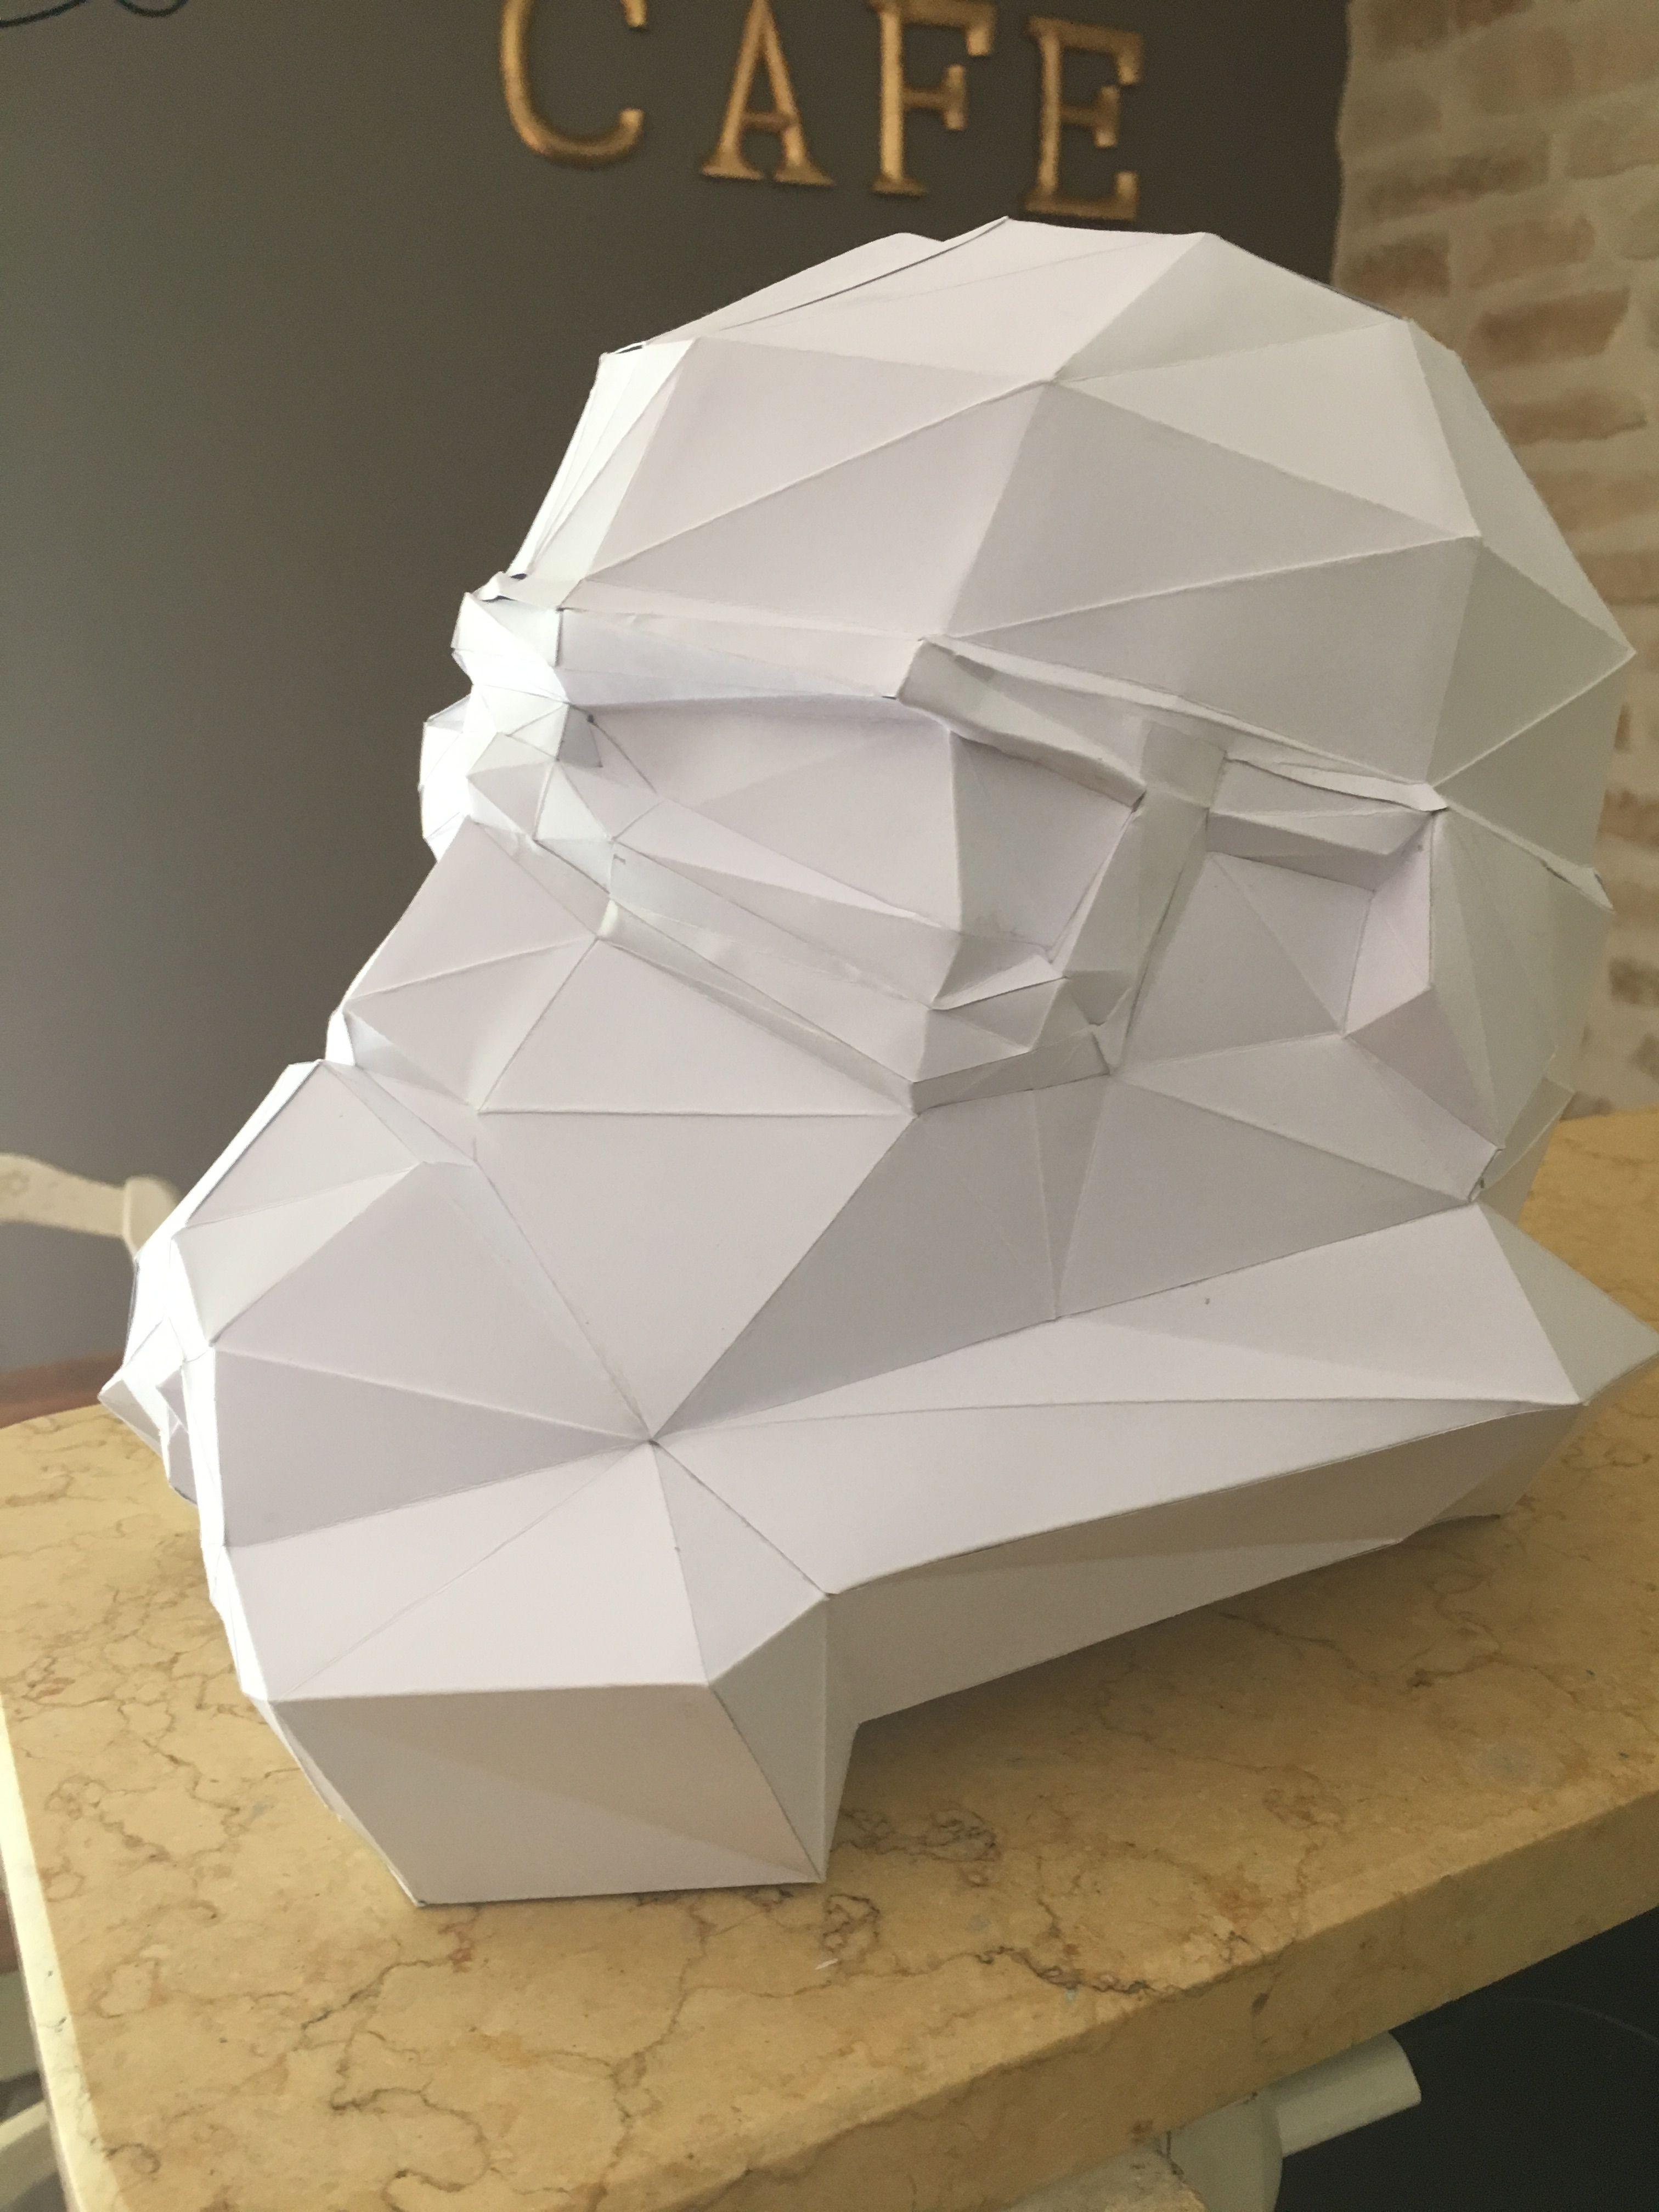 Papercraft Stormtrooper Stormtrooper Papercraft La Guerre Des étoiles Star Wars